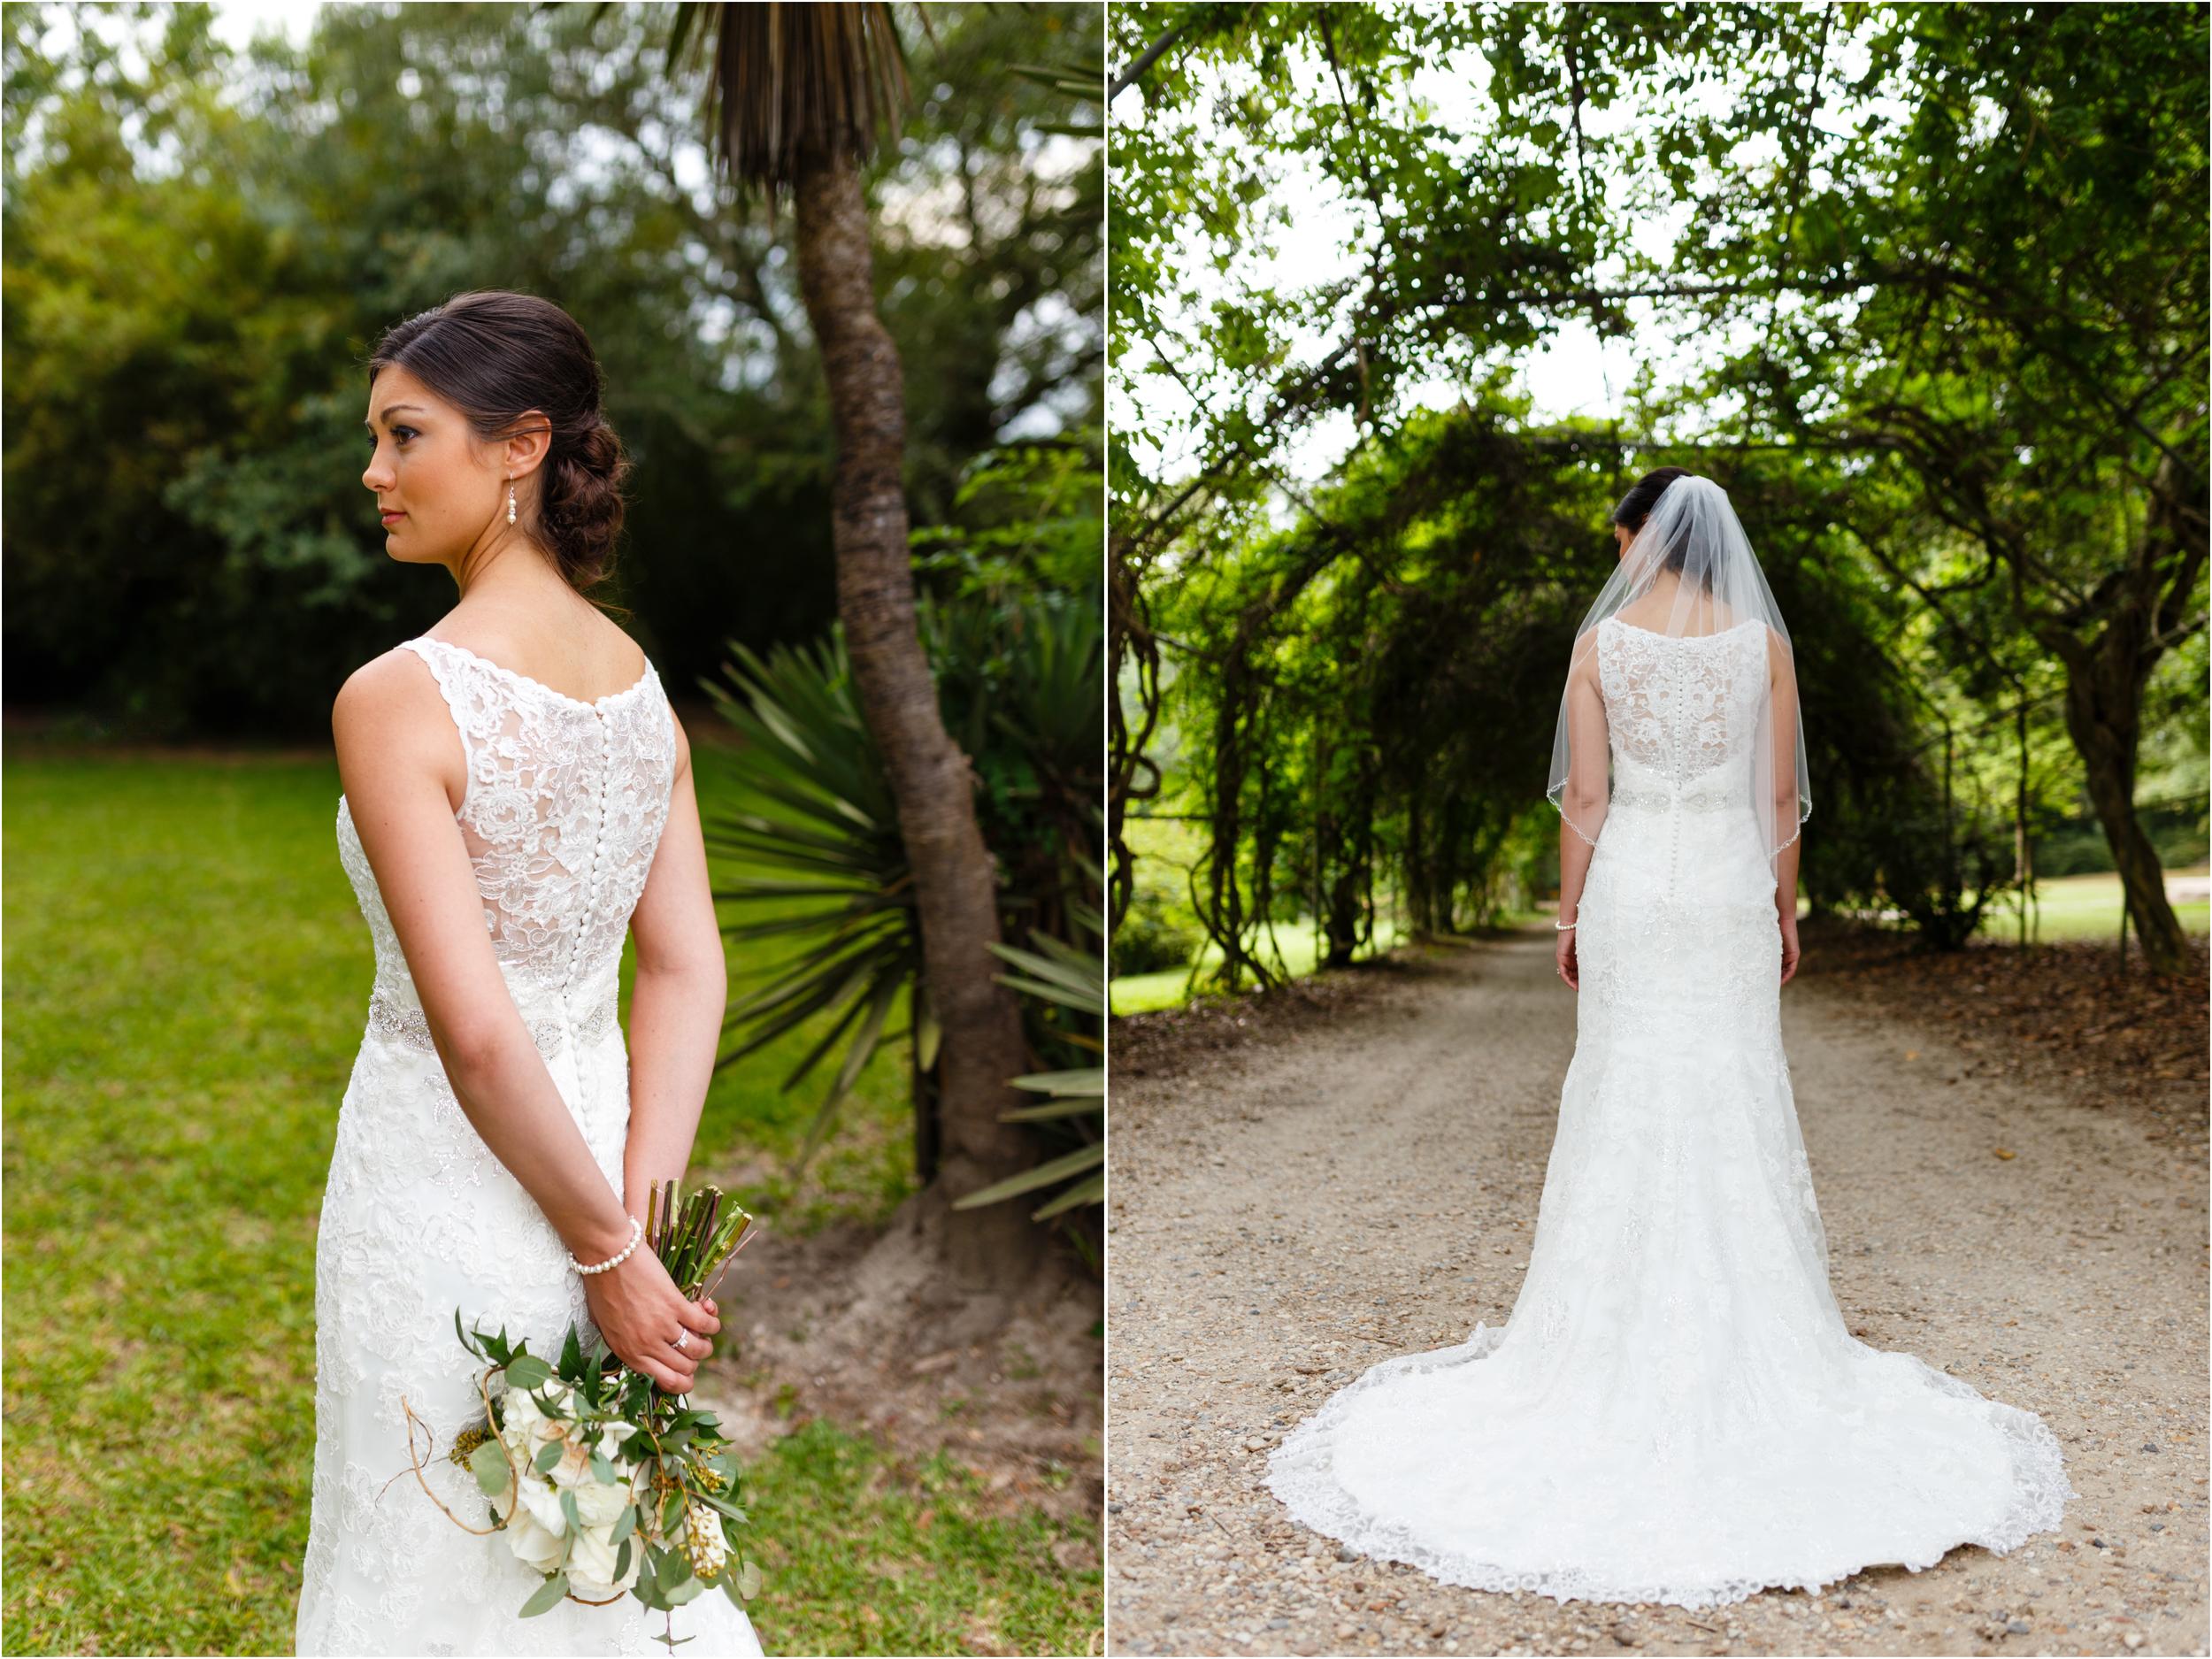 Bridal-wedding-portrait-lafayette-broussard-youngsville-photographer-6 (2).jpg